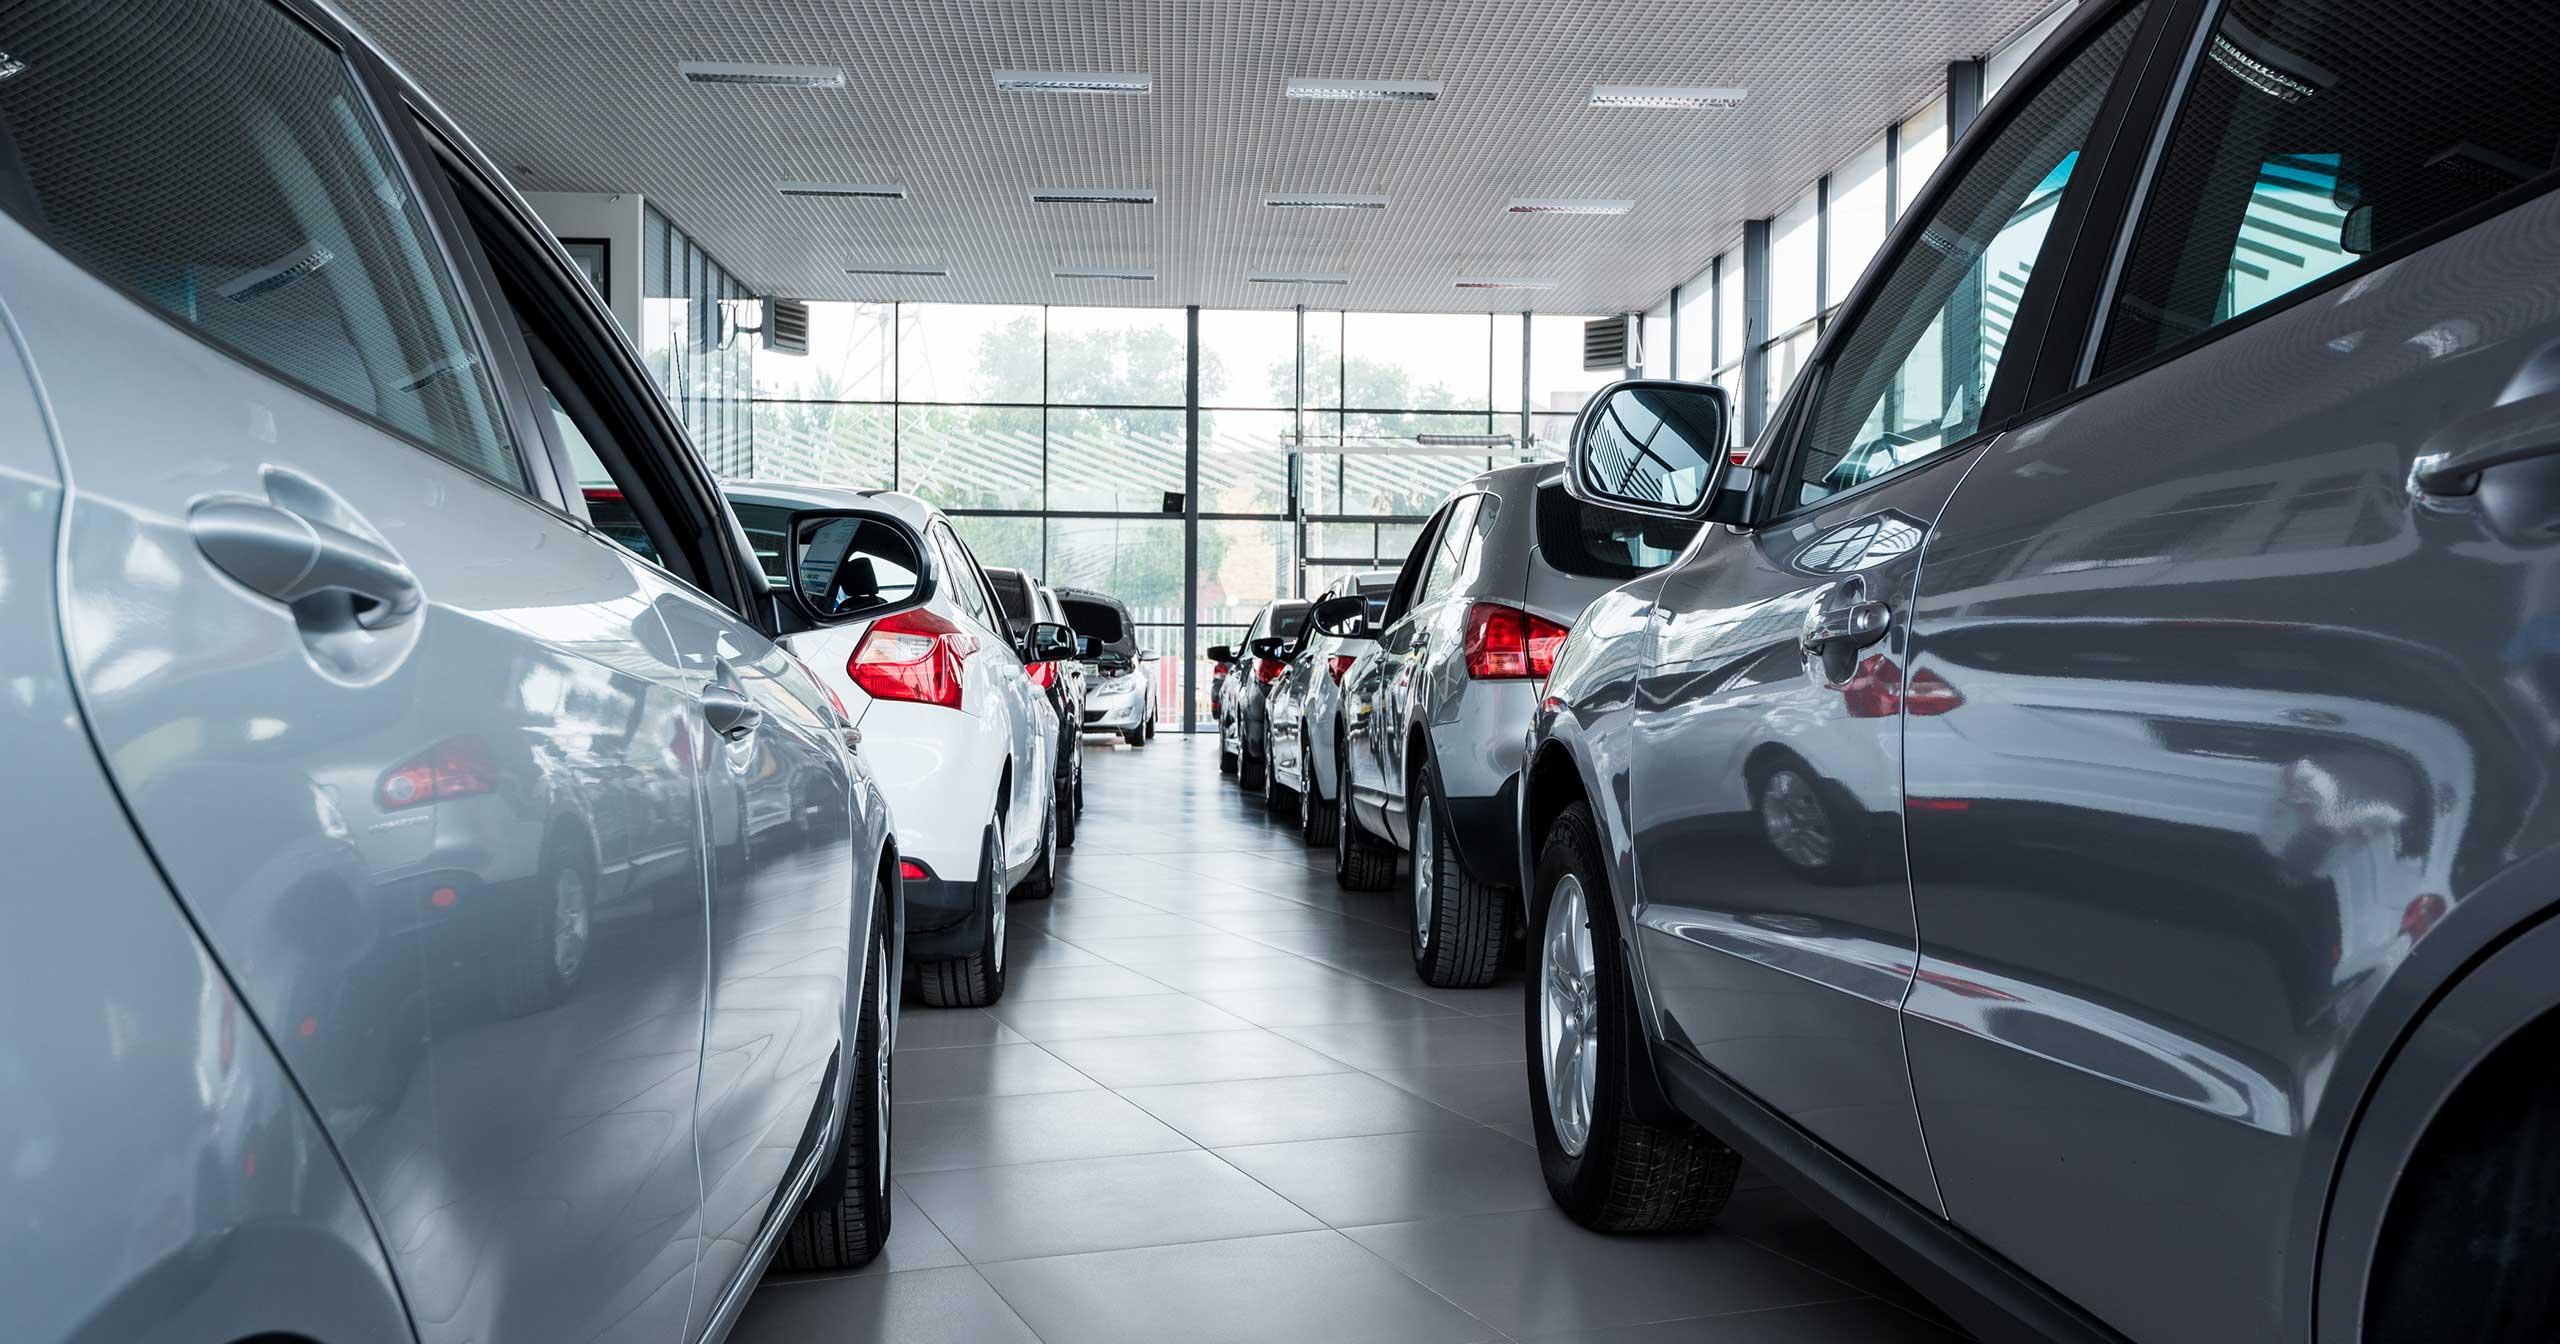 2018 Consumer Survey of Automotive Finance Perceptions